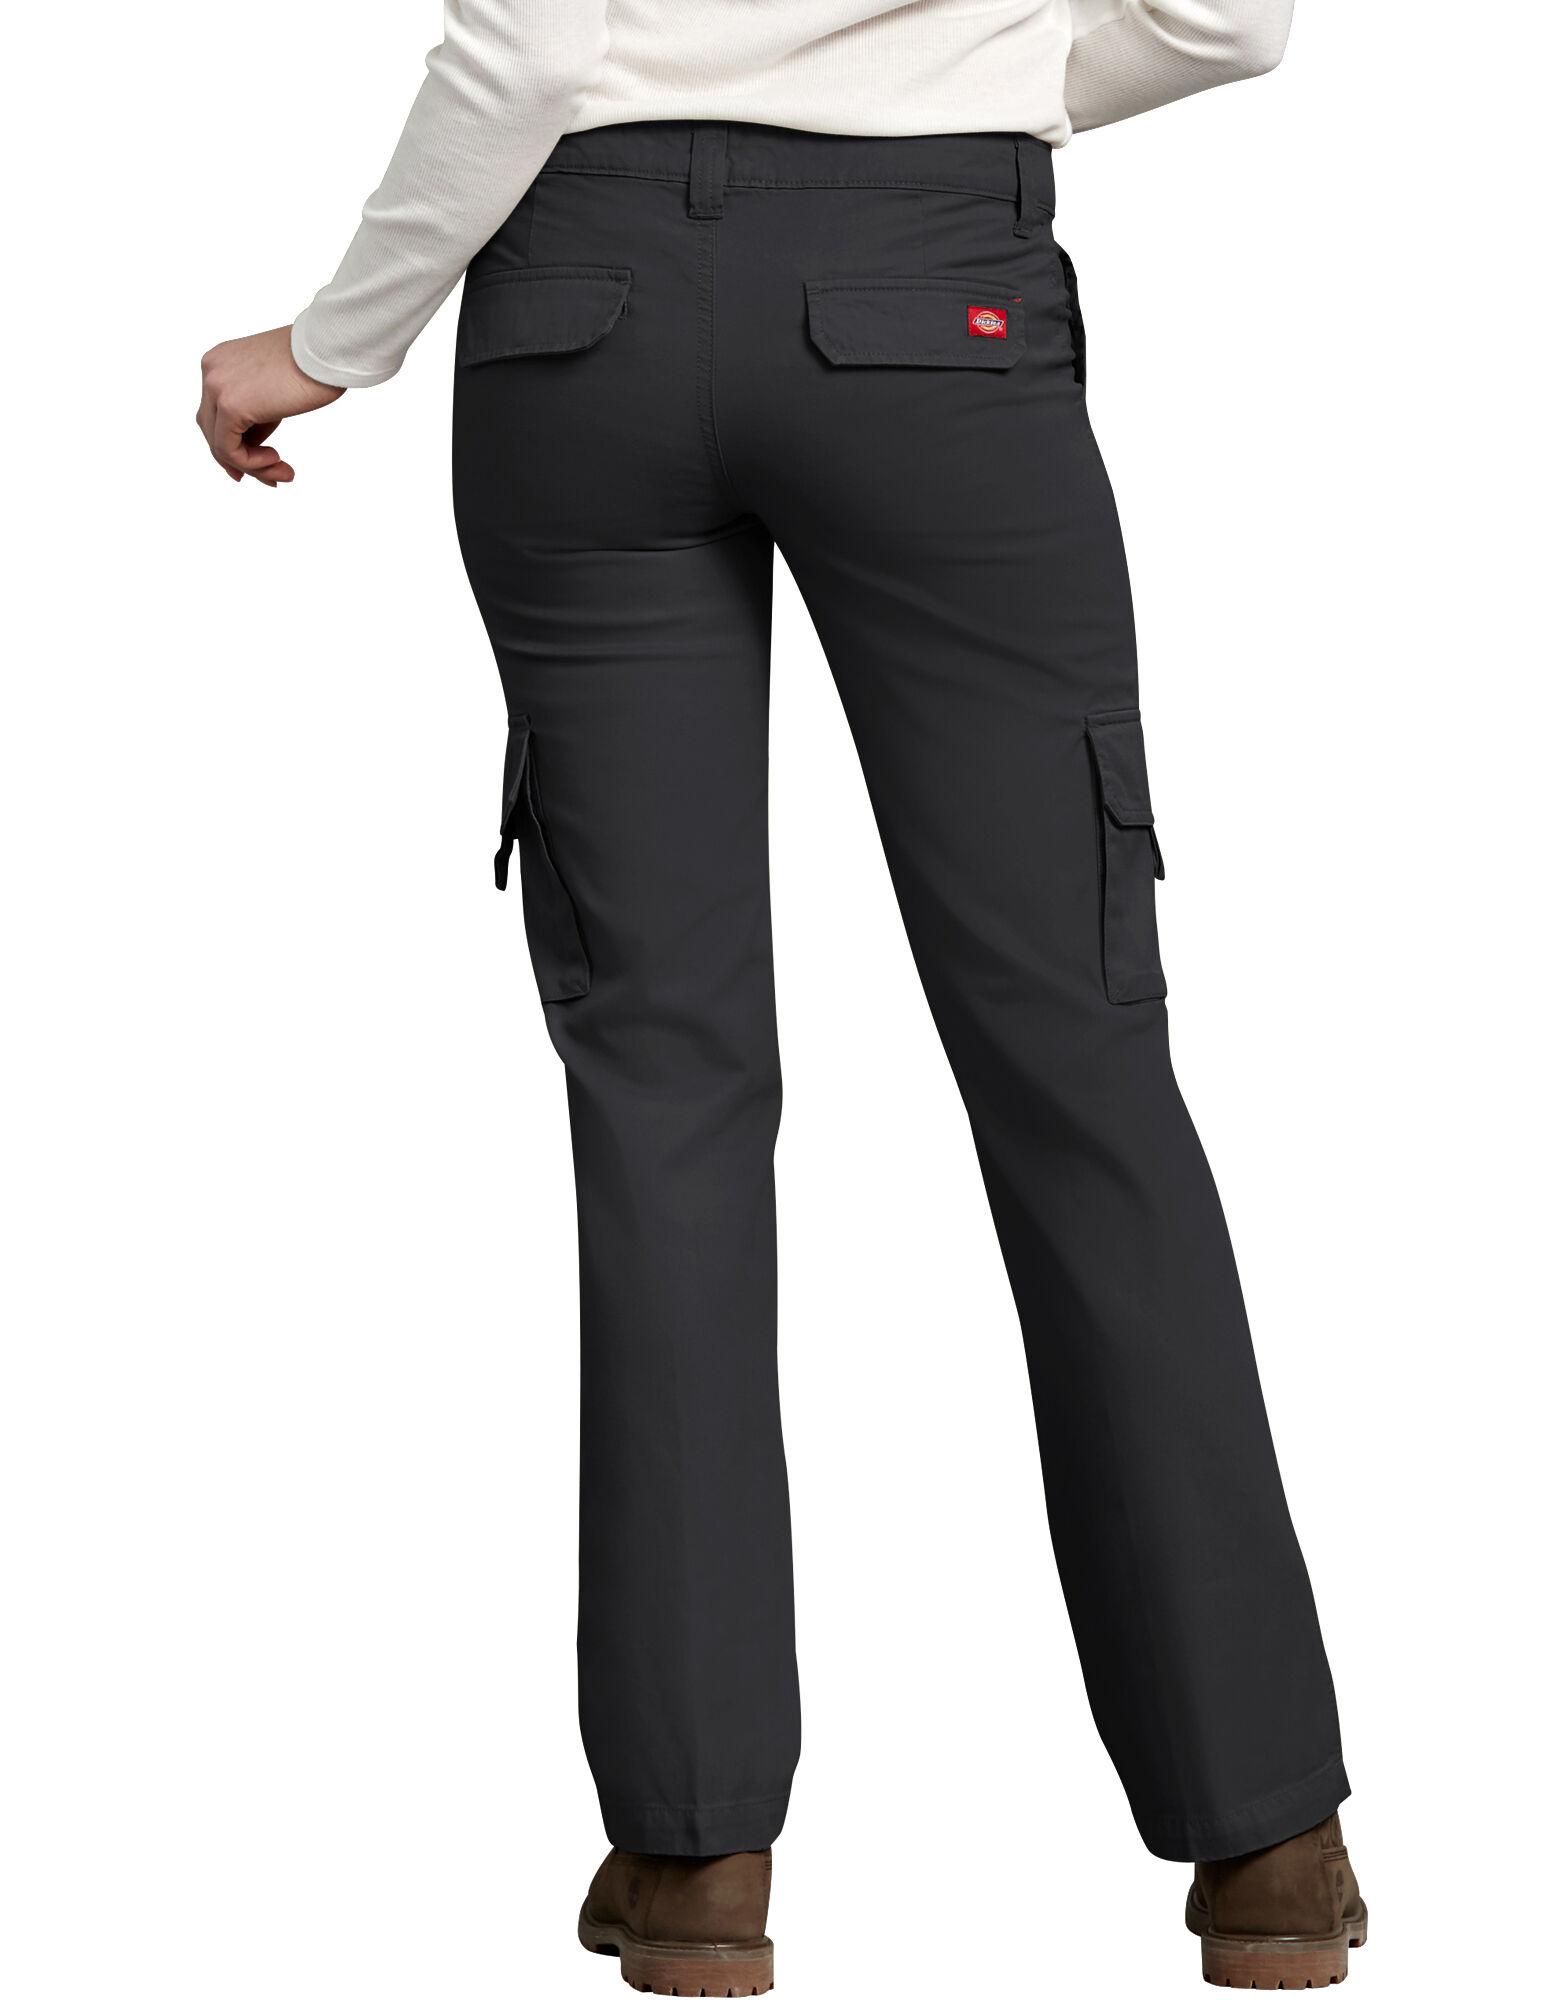 Cool FP777 Dickies Women39s Cargo Pant